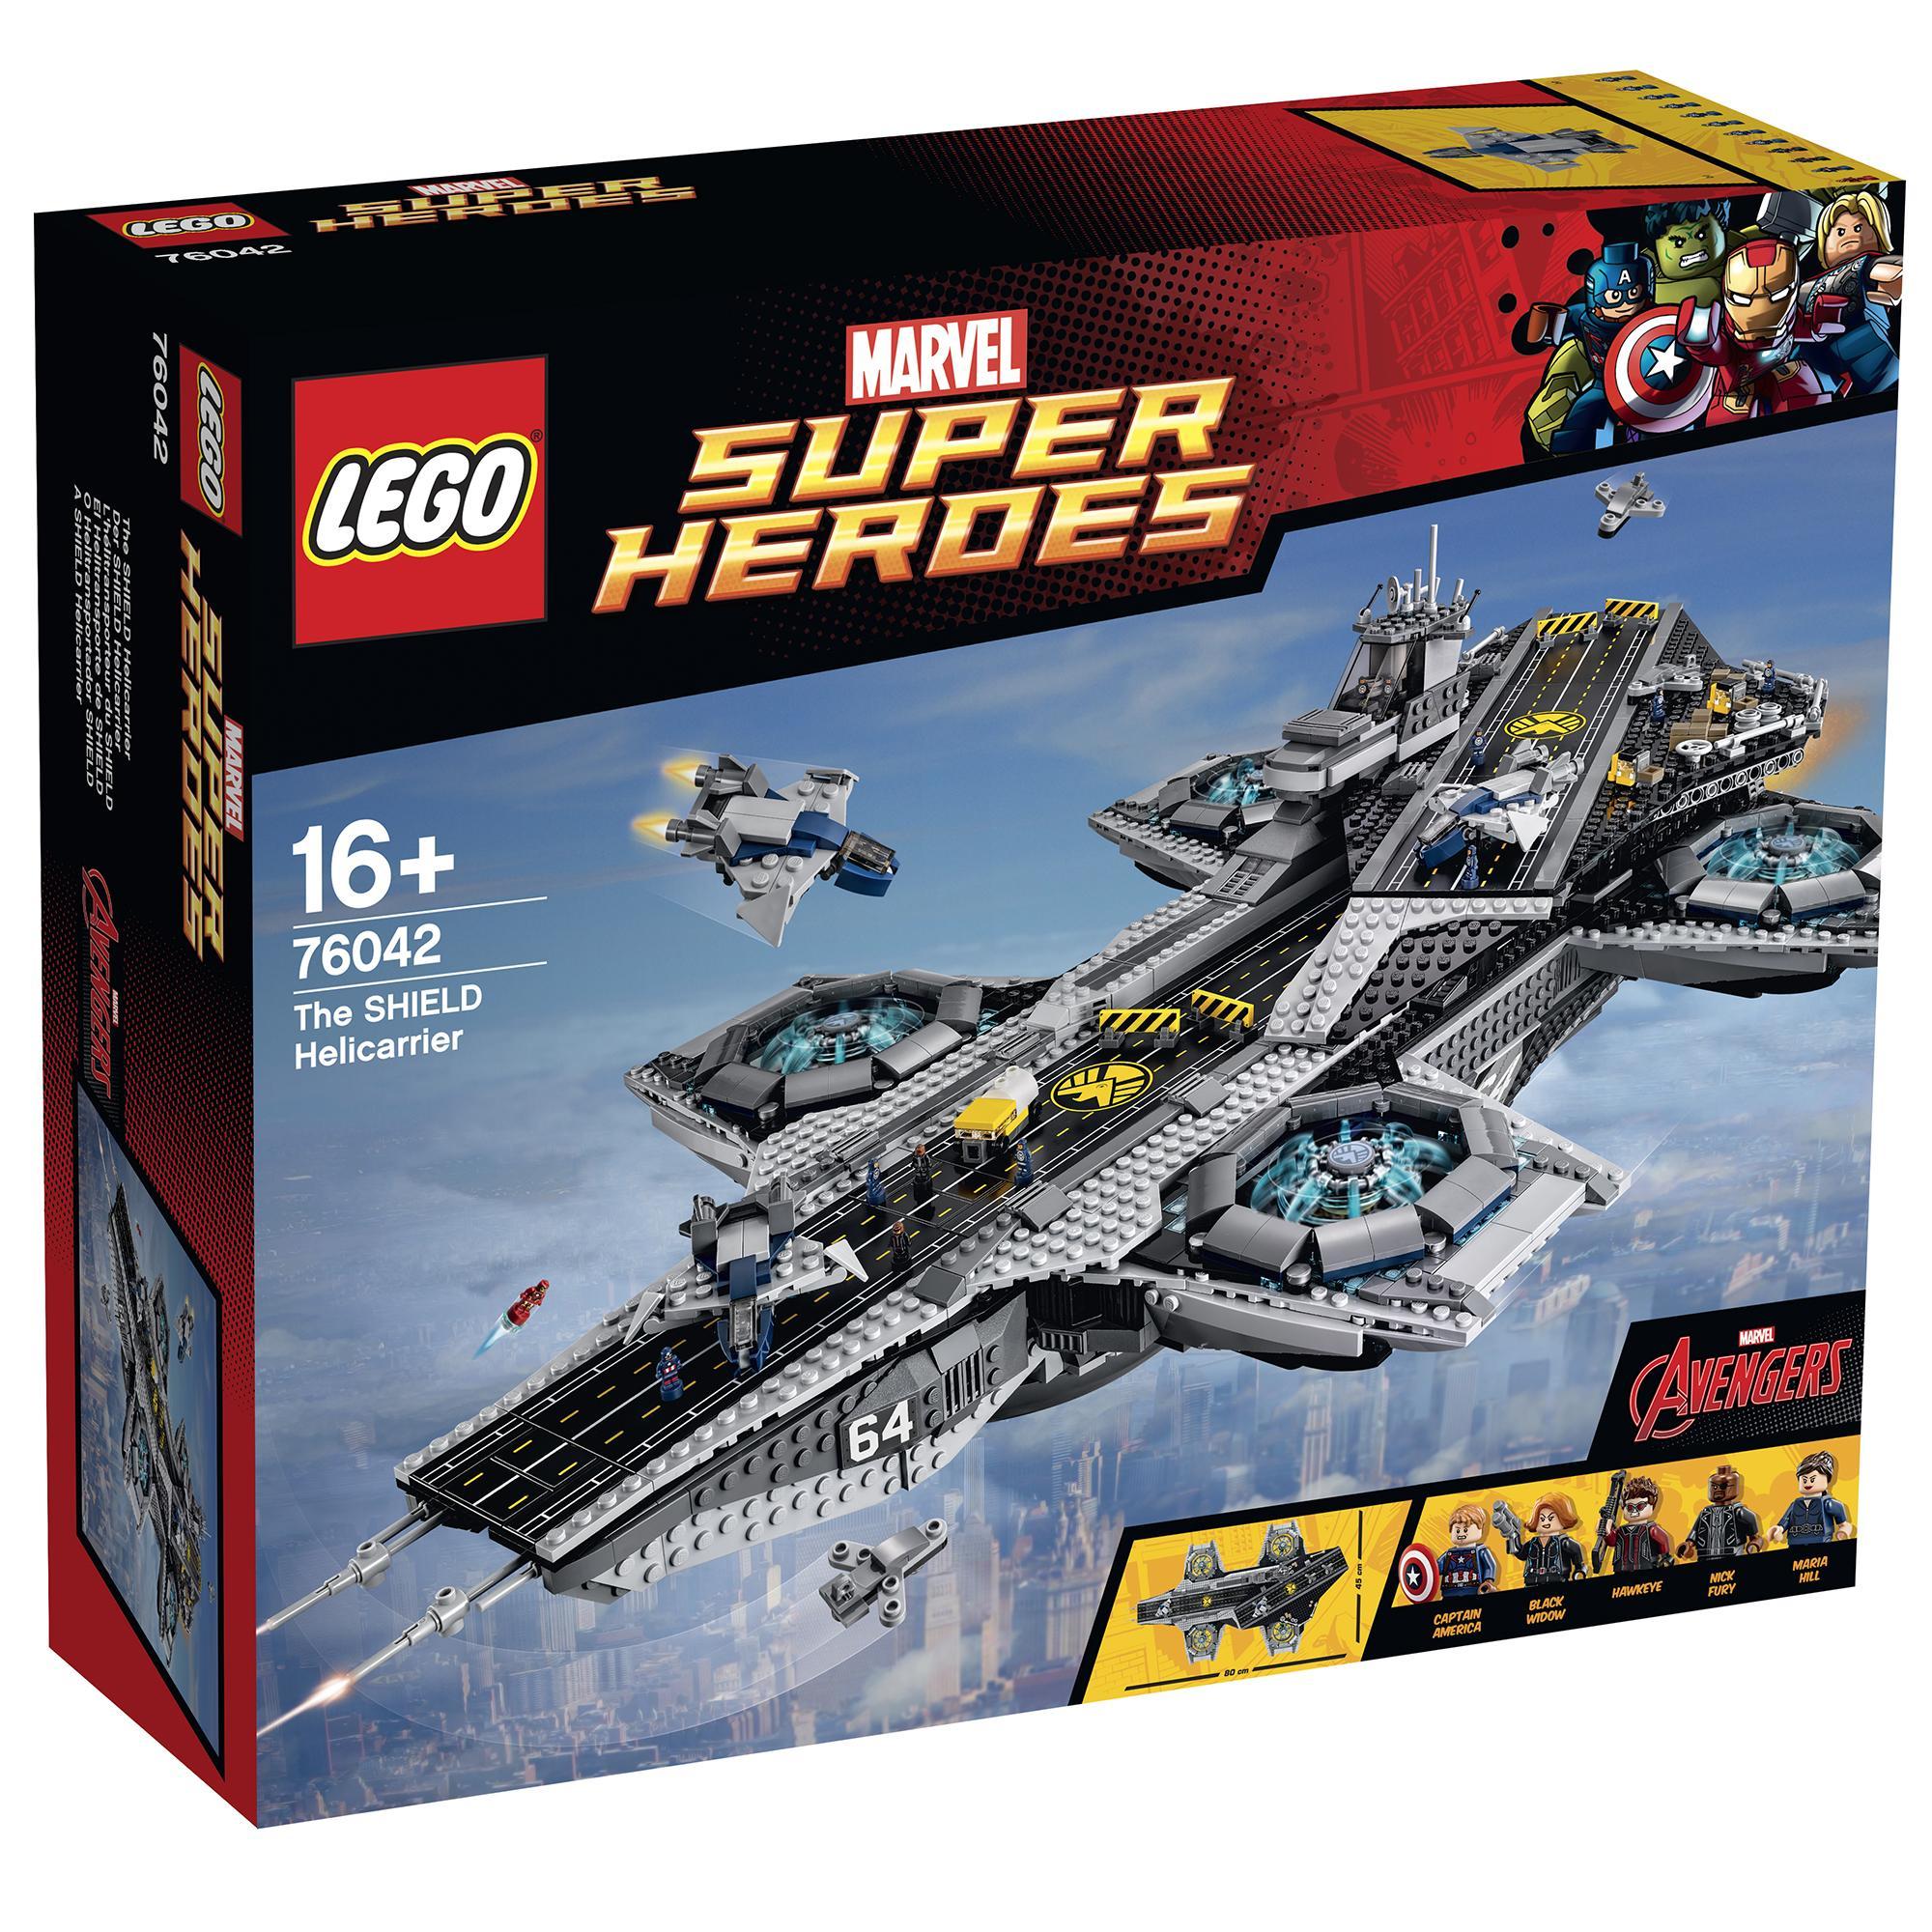 LEGO Marvel The Shield Helicarrier 76042 £224 (RRP £279.99) @ Hamleys